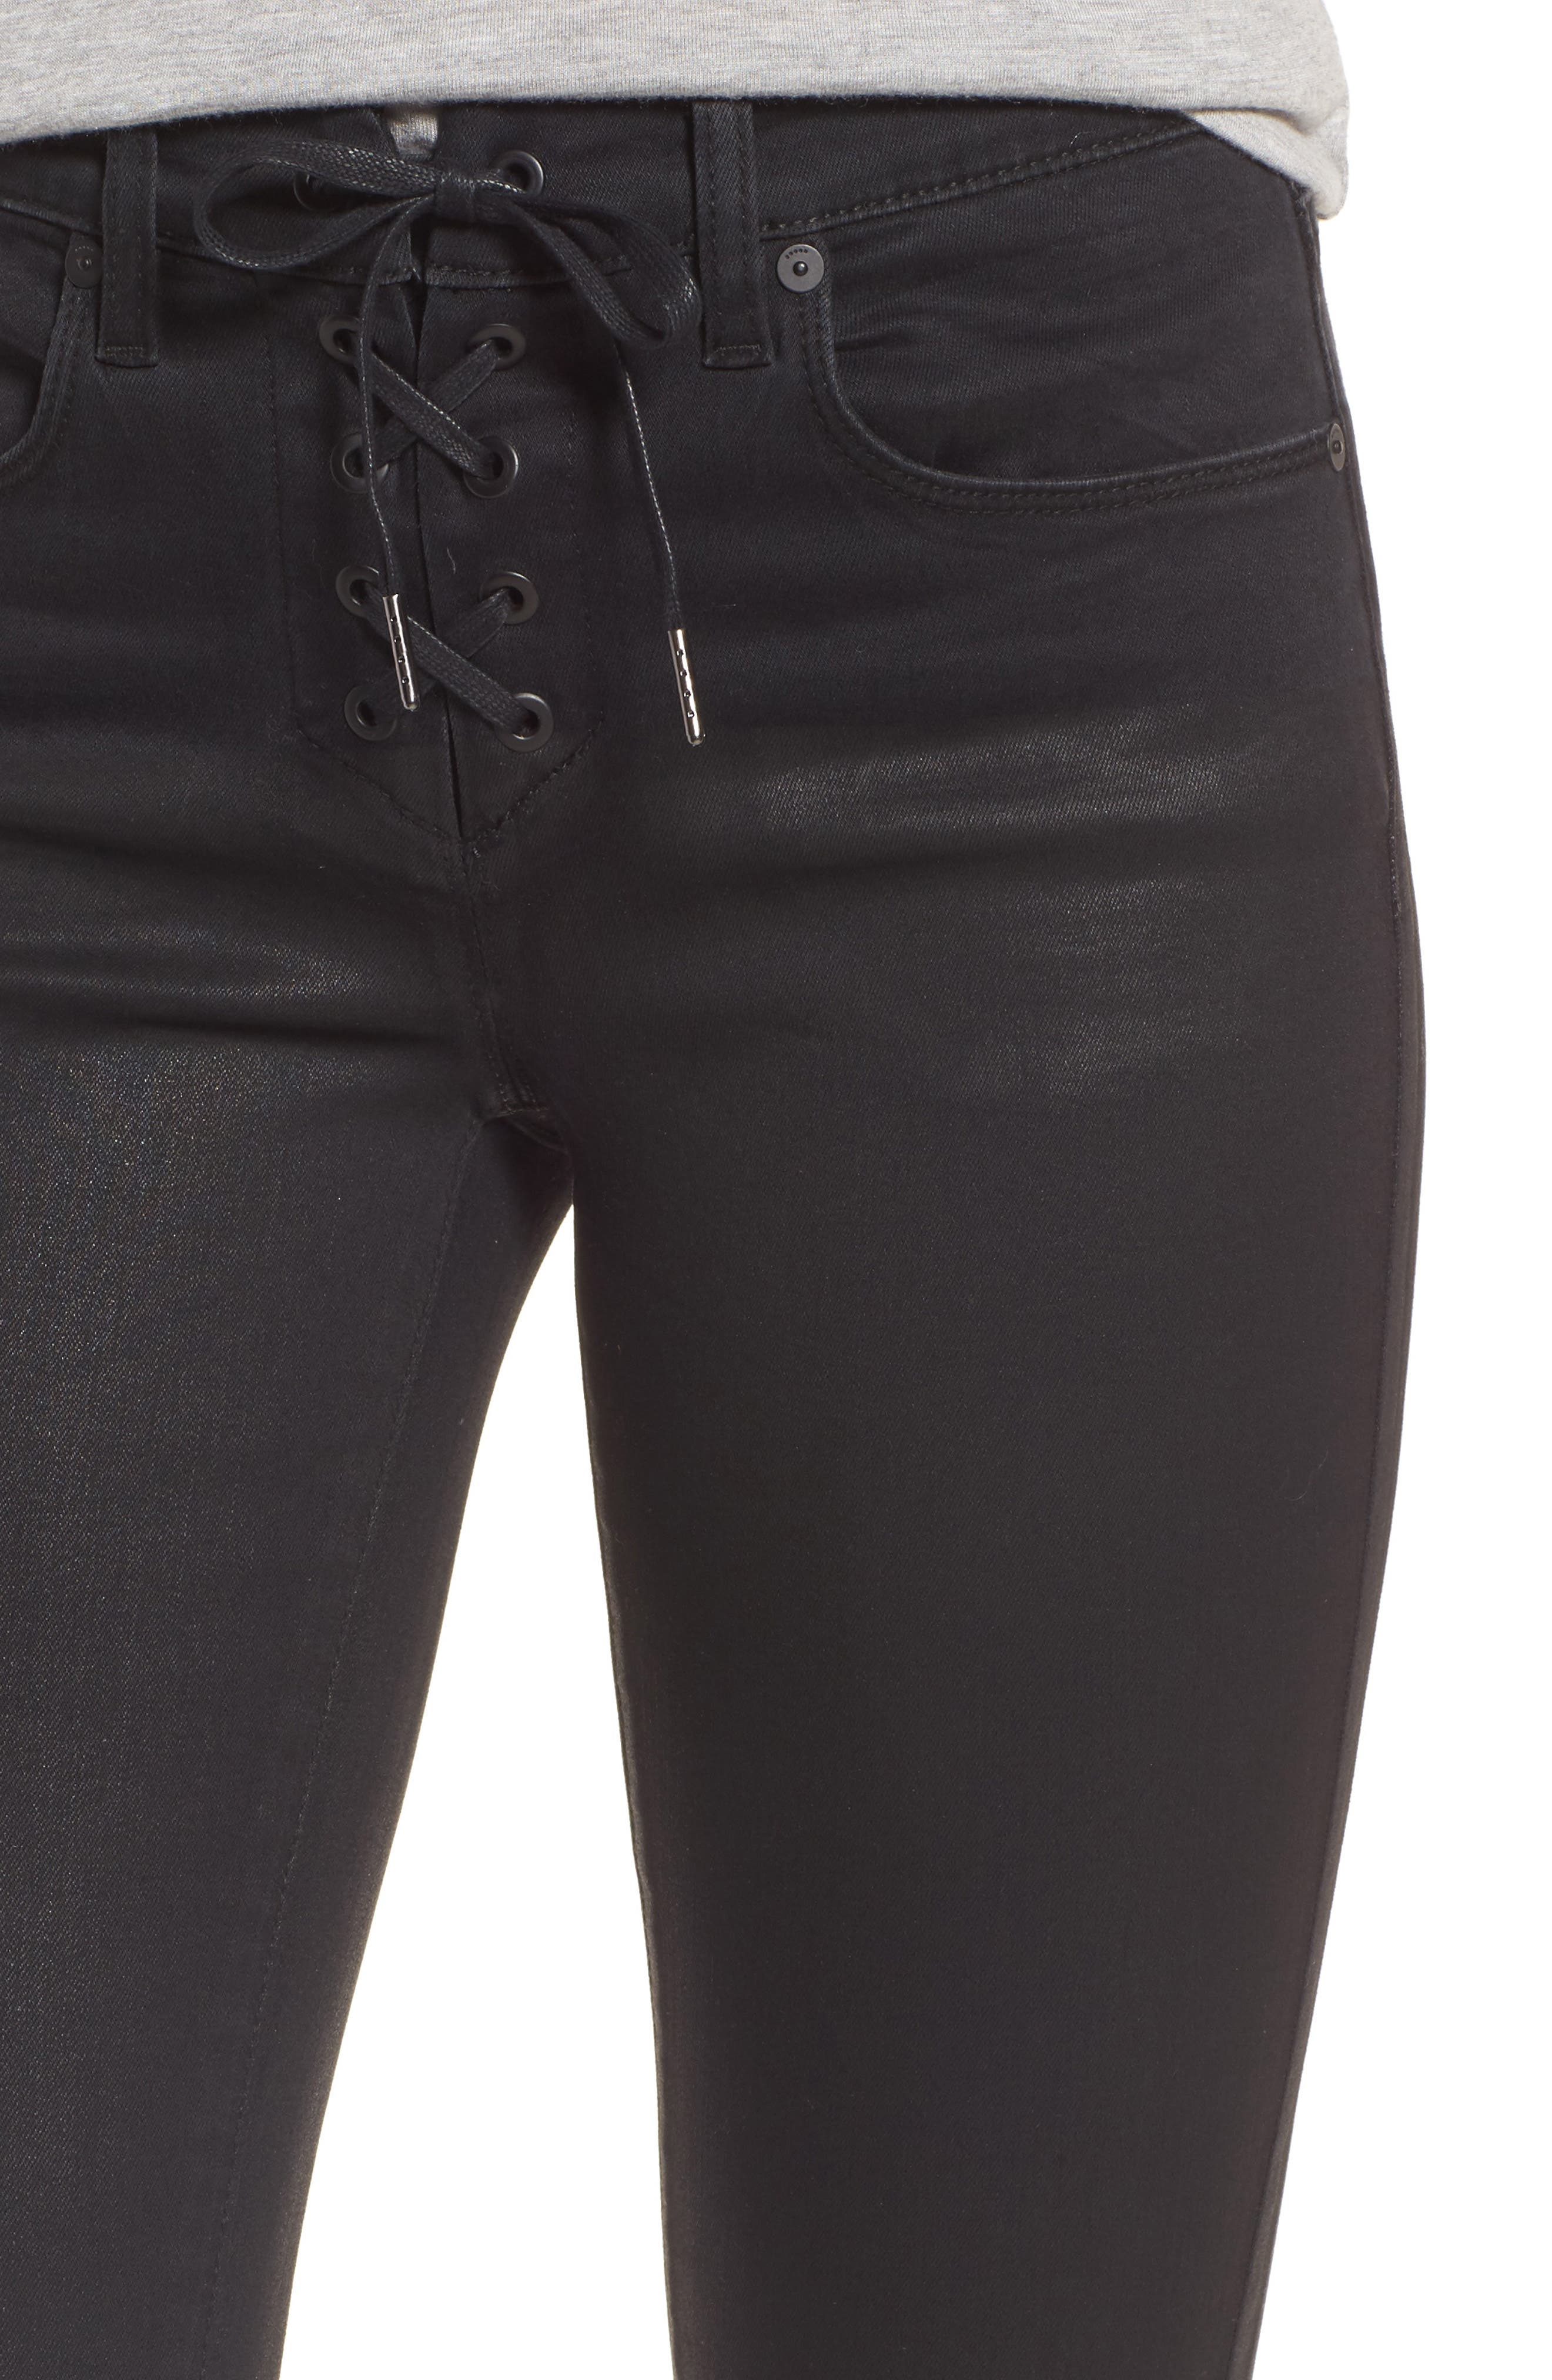 Black Jack Lace-Up Skinny Jeans,                             Alternate thumbnail 4, color,